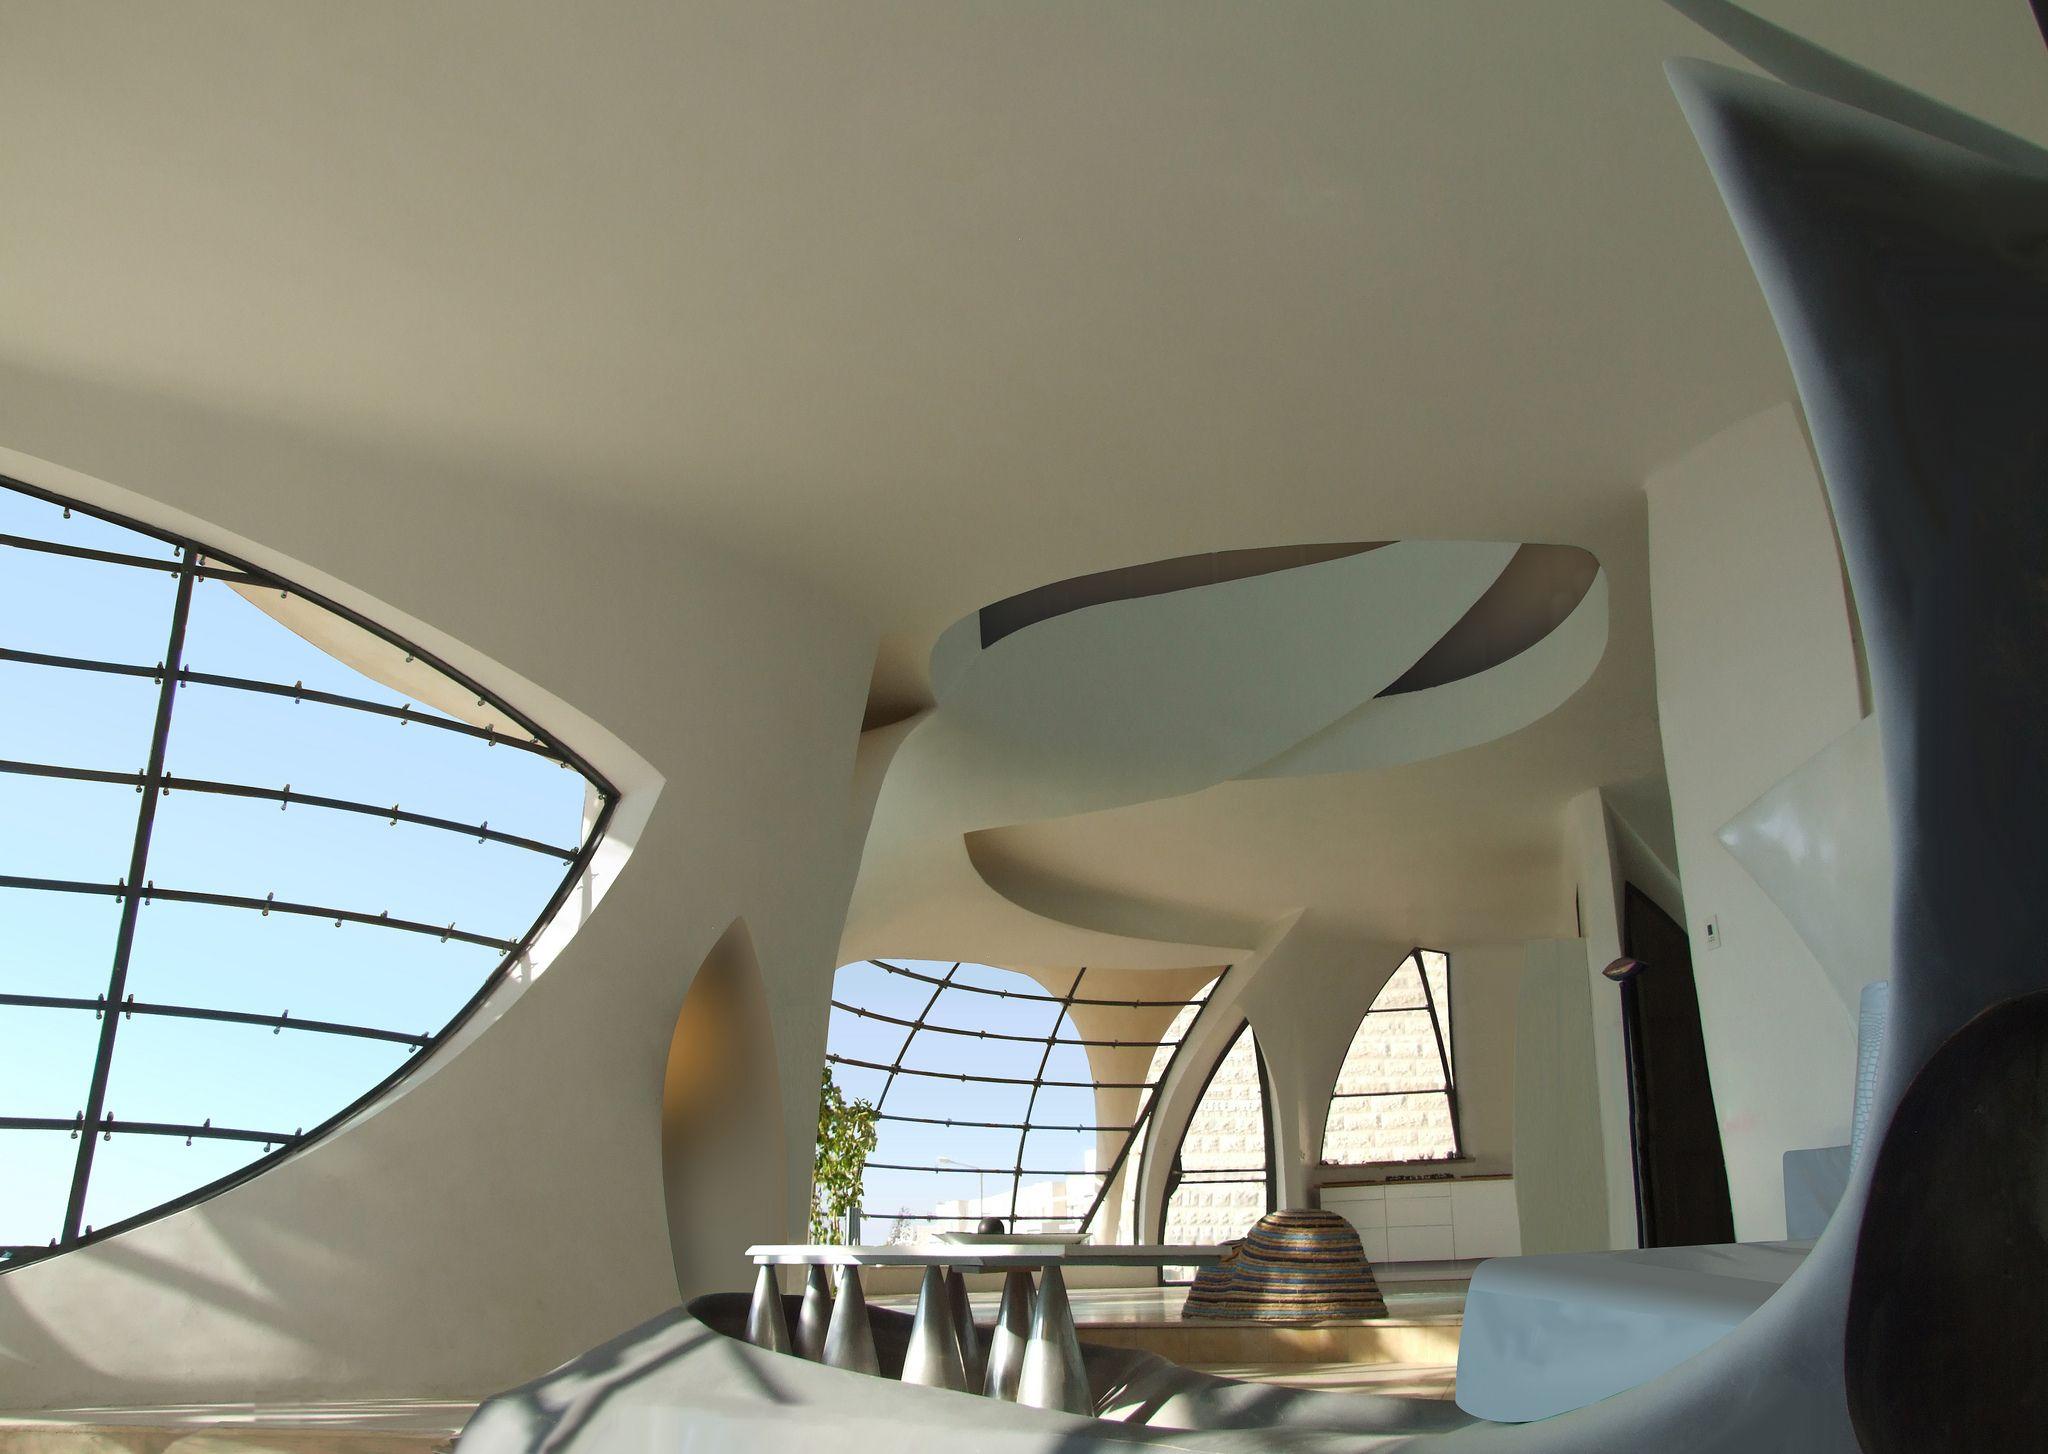 Futuristic house Biomorphism by Ephraim Henry Pavie